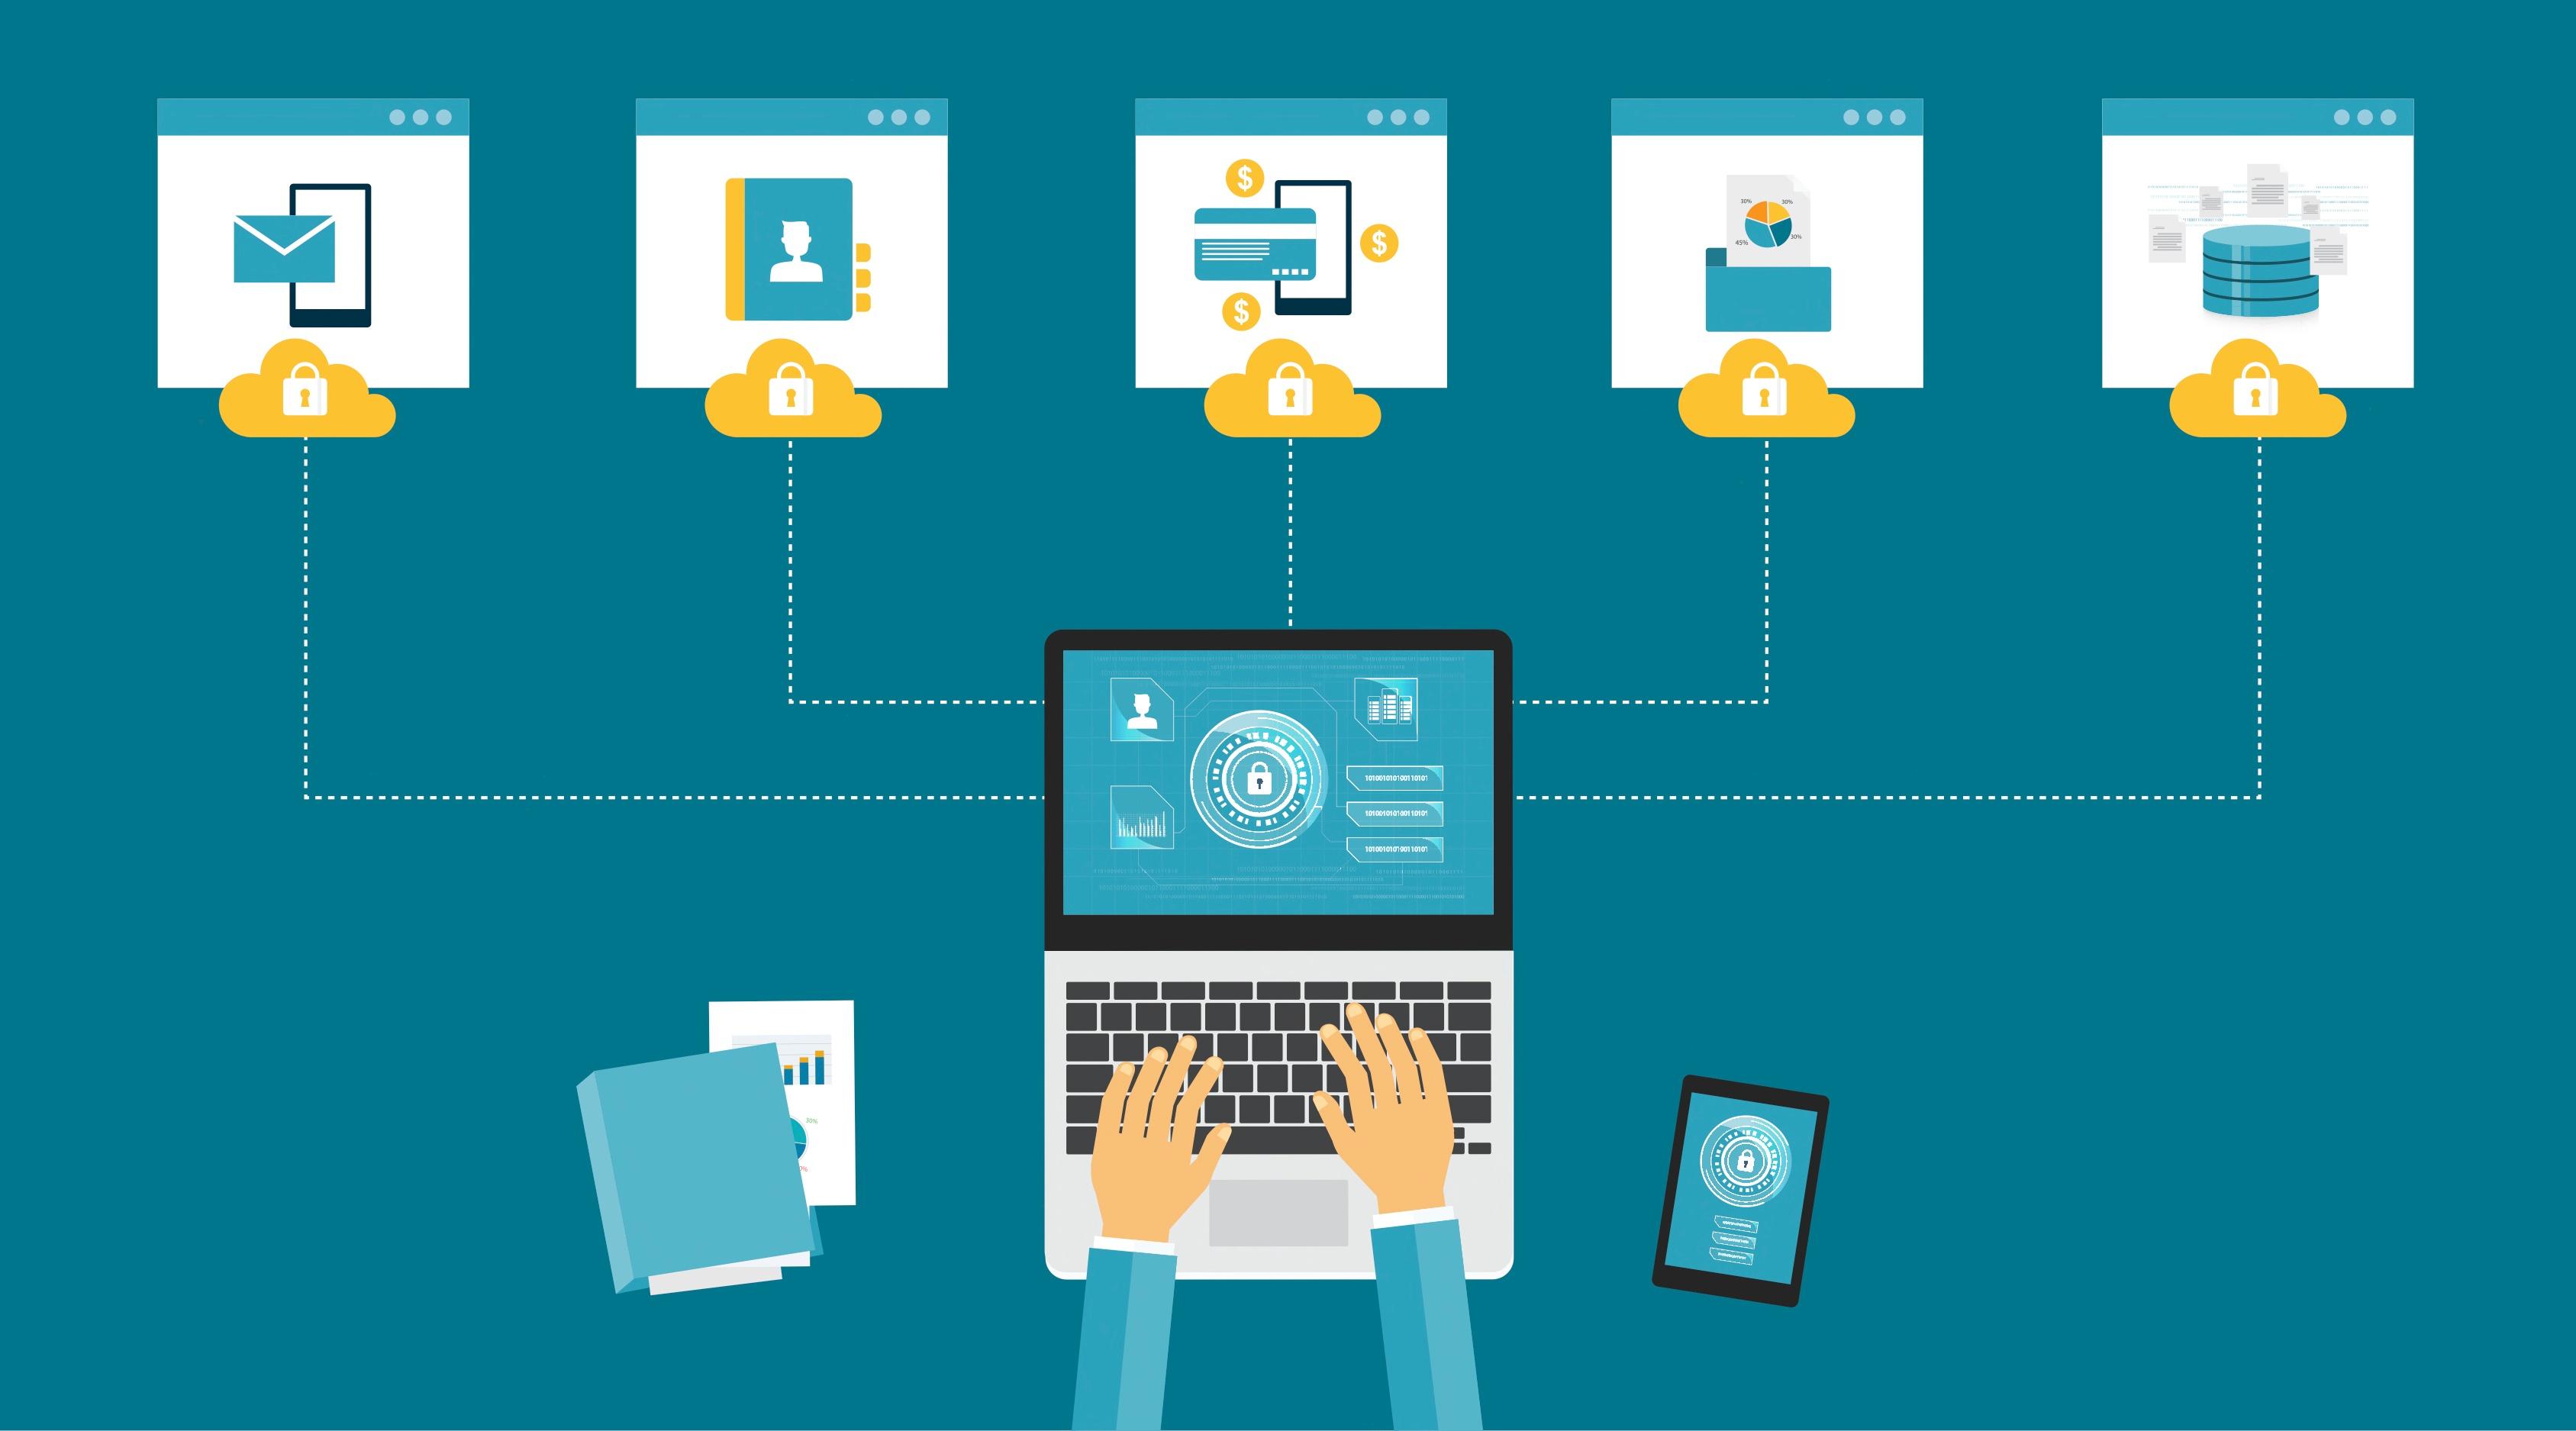 cloud password management - PAM - password